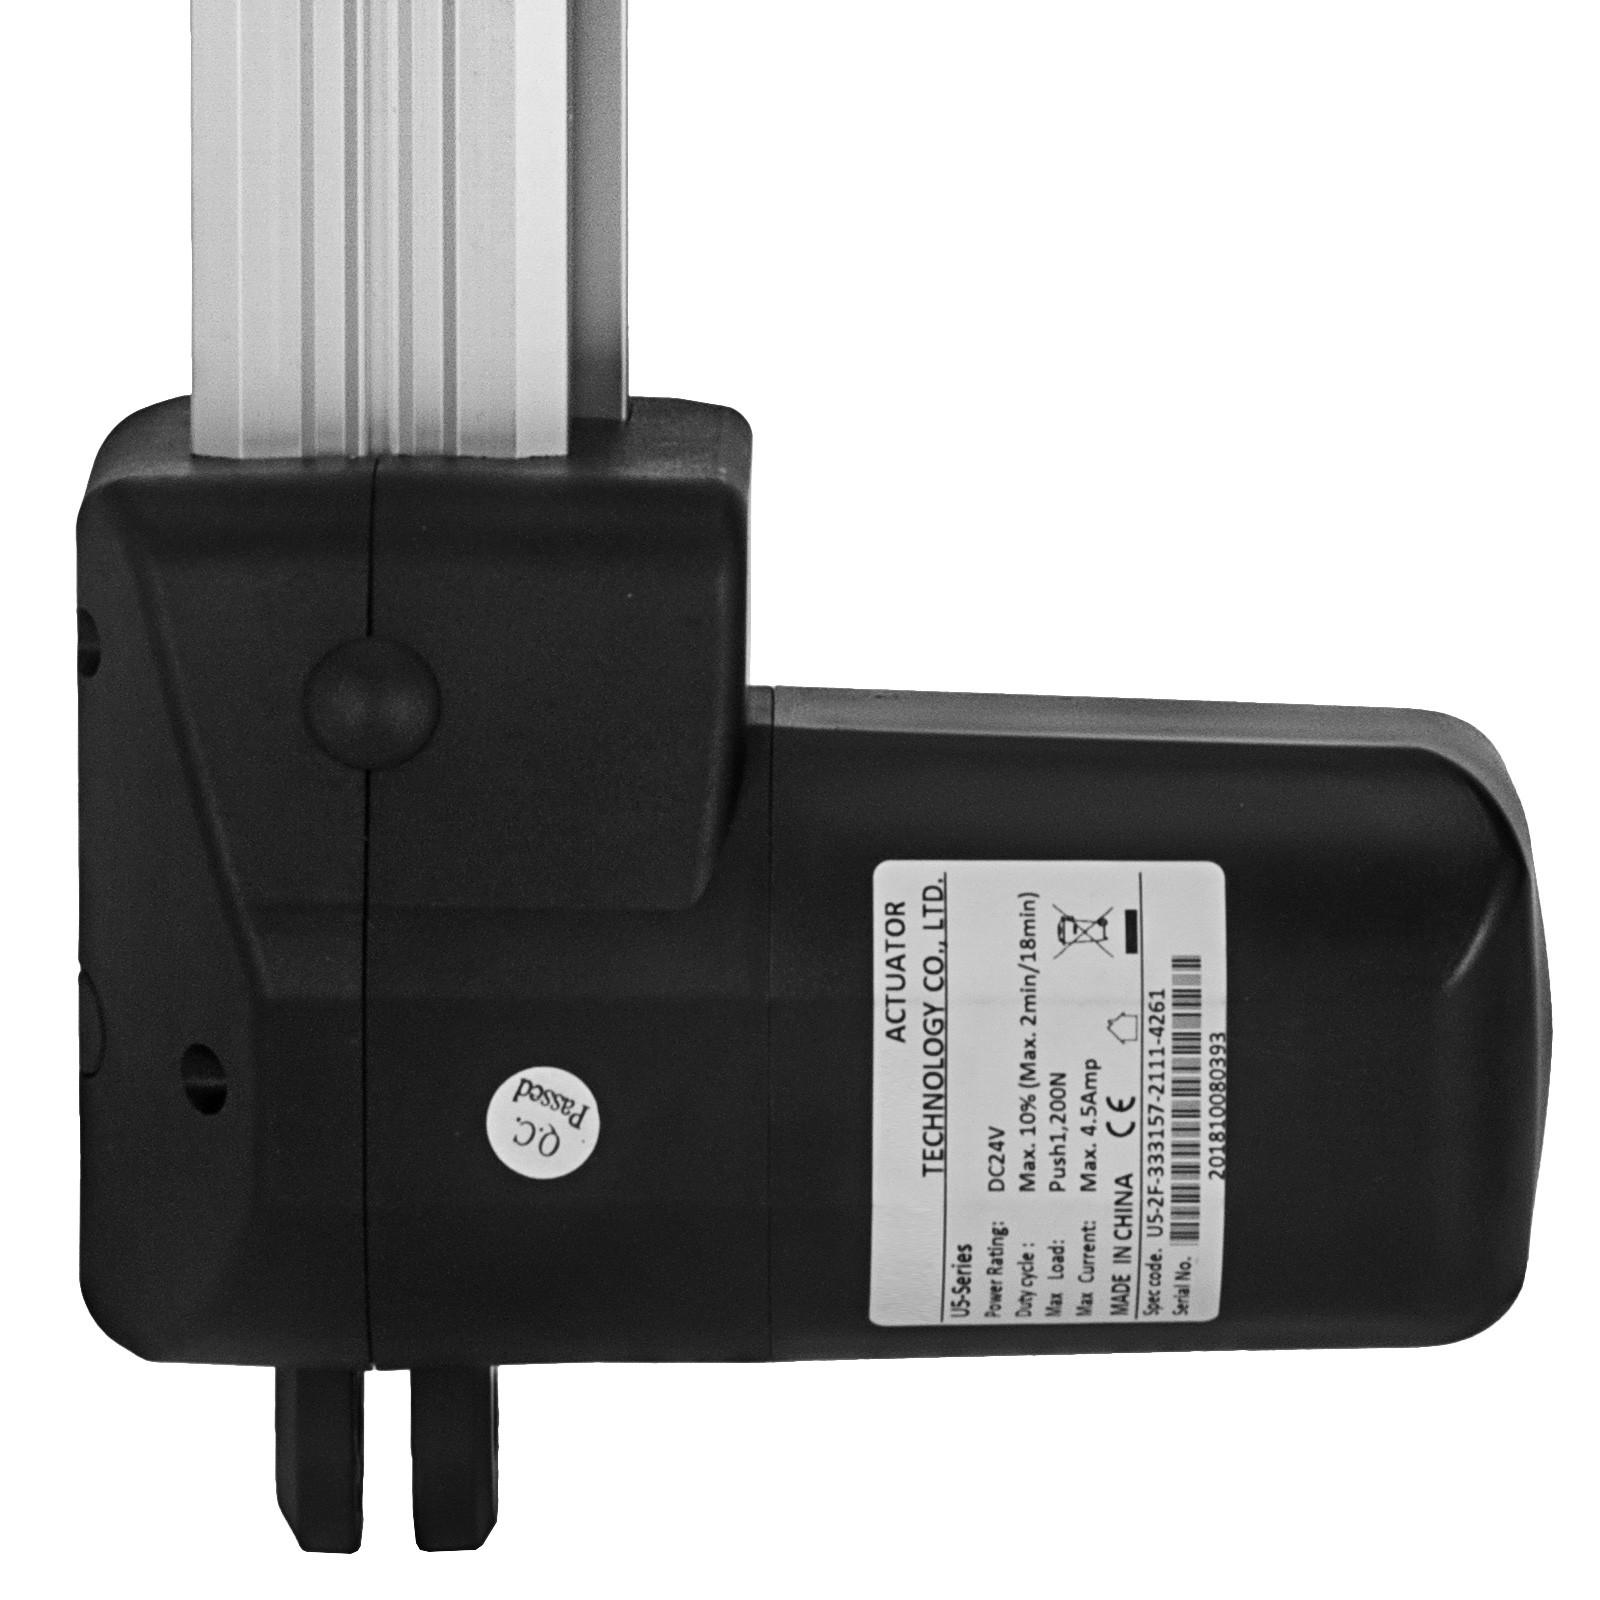 Power Recliner Replacement Motor Actuator Lift Mechanism